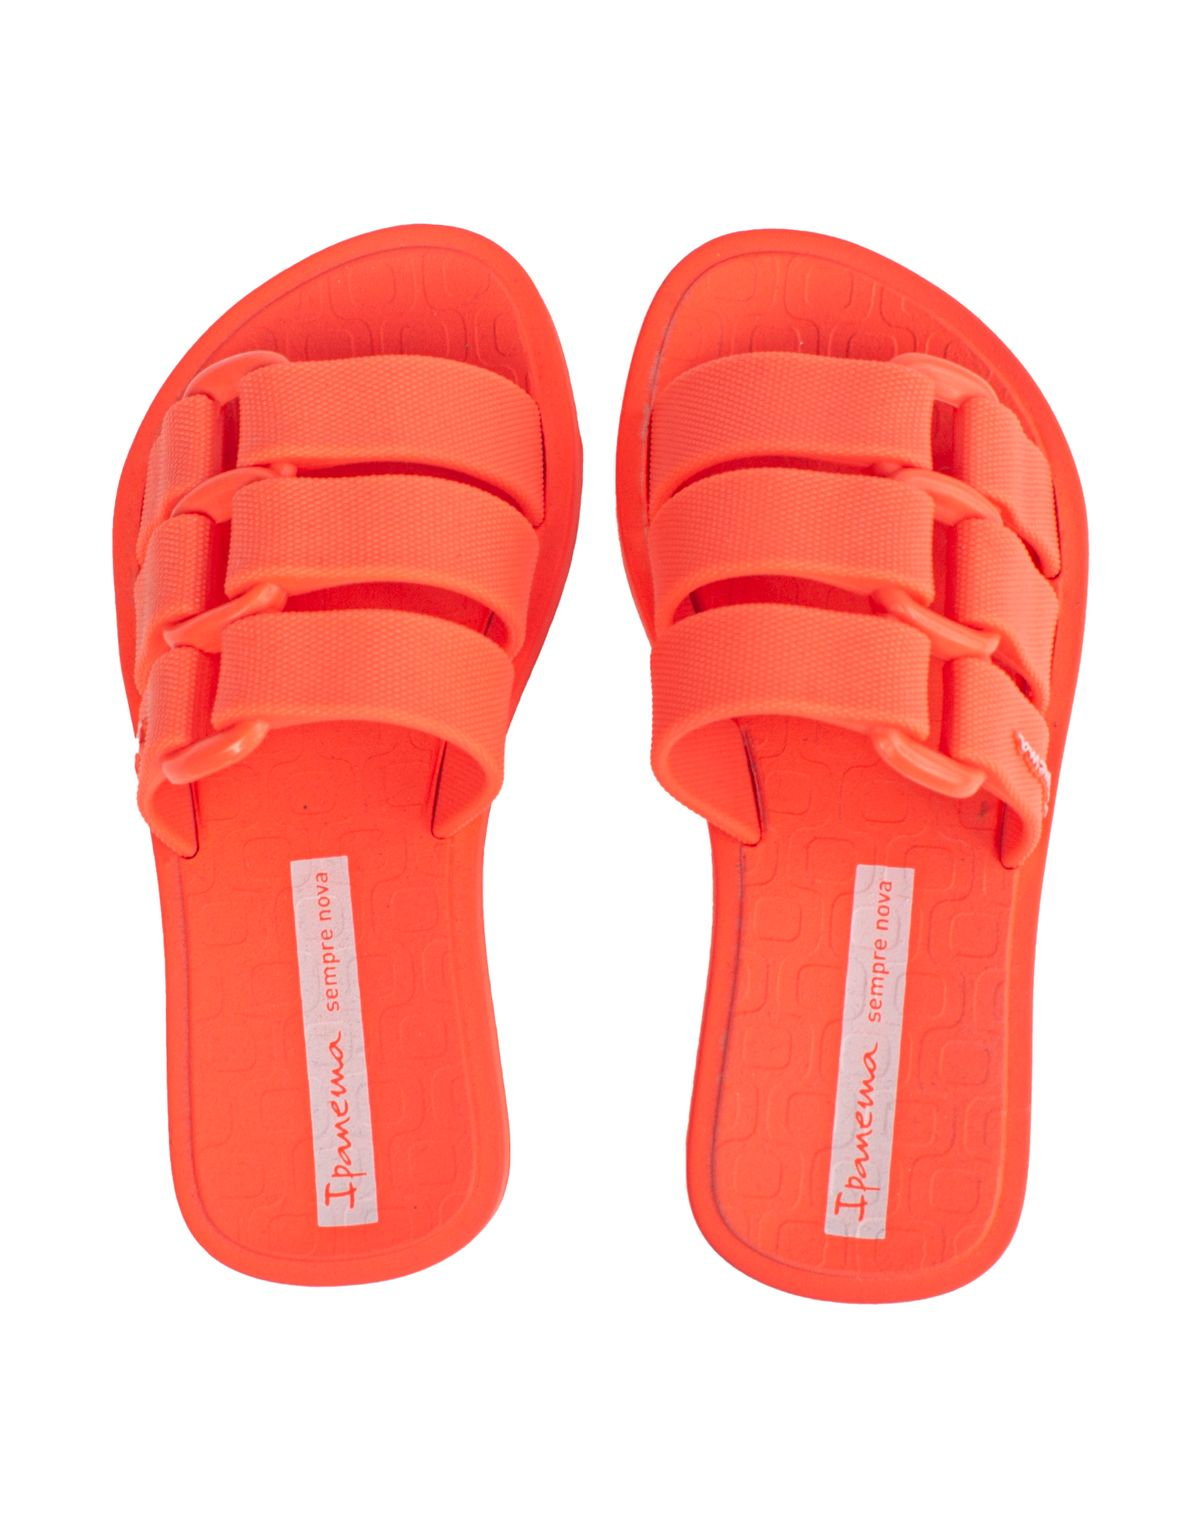 559063014-chinelo-infantil-slide-ipanema-rosa-neon-30-346